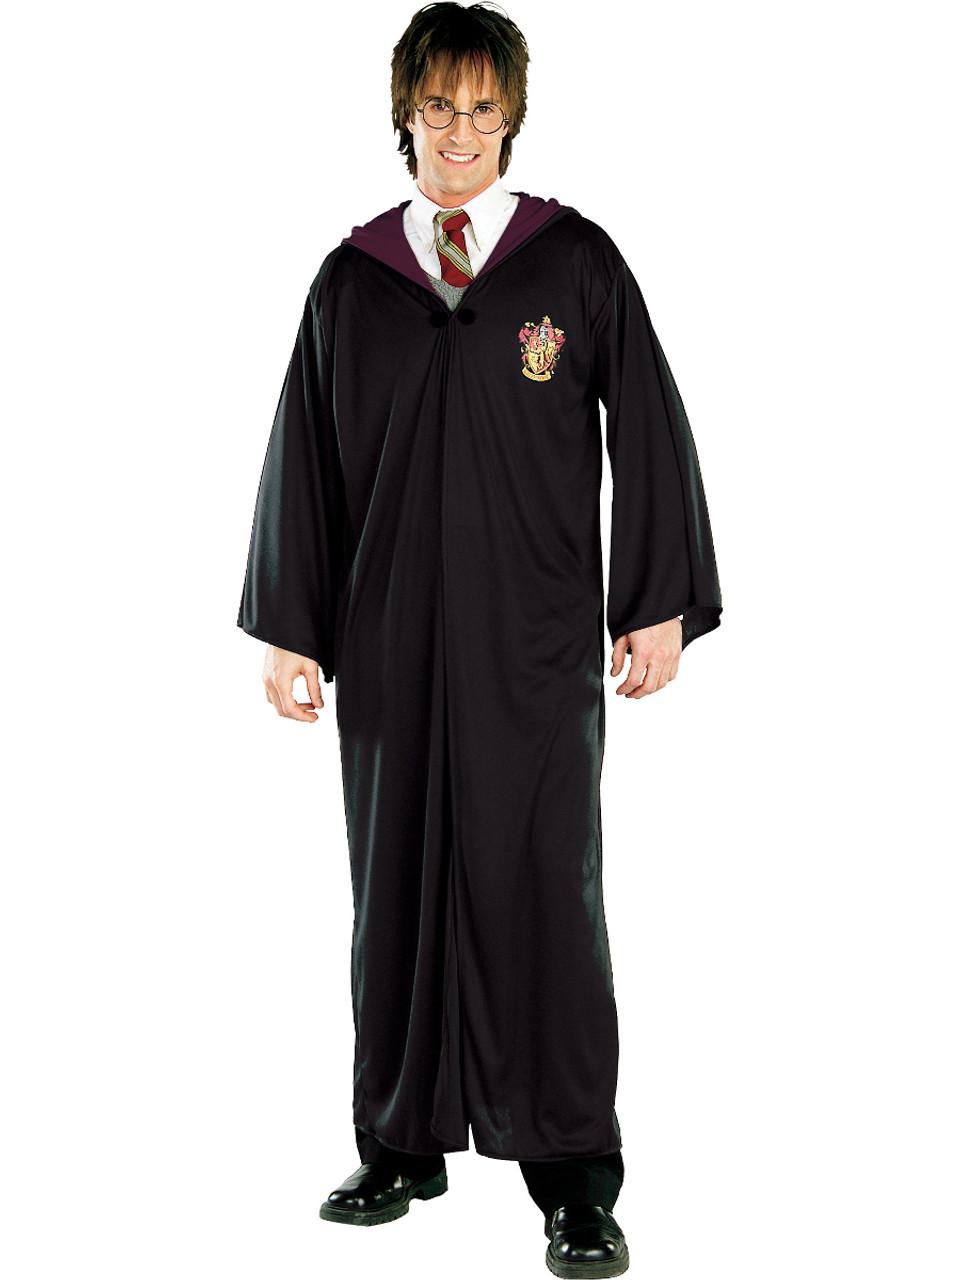 f56b3f199ec09 Adult Harry Potter or Hermione Granger Costume Robe New